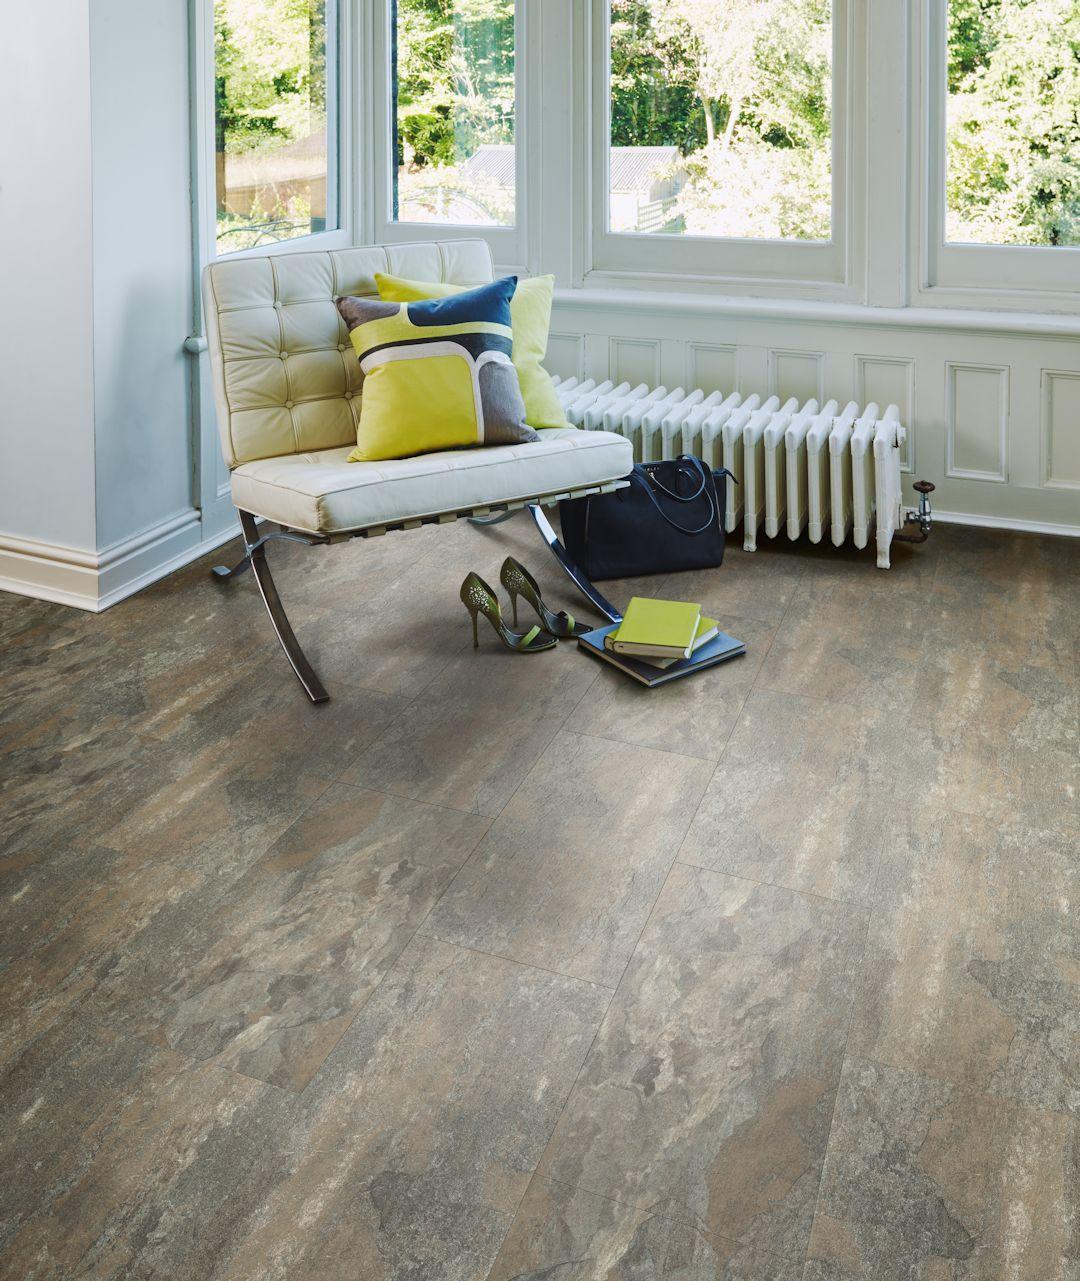 Ocean slate camaro luxury vinyl tile flooring featured in living ocean slate camaro luxury vinyl tile flooring featured in living room dailygadgetfo Image collections